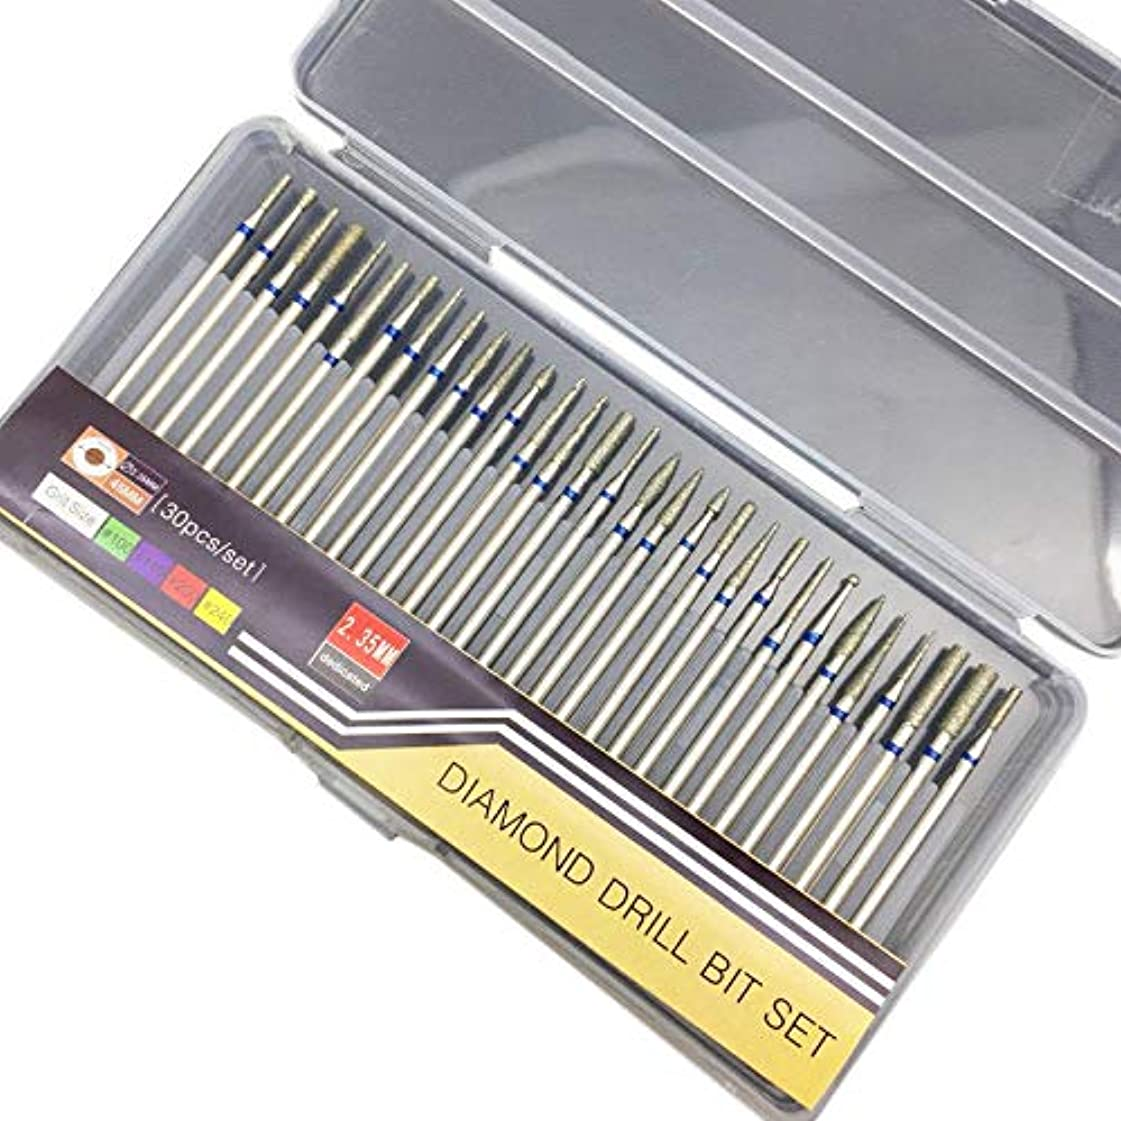 CUHAWUDBA 30個 電動マニキュア機用アクセサリーセクションダイヤモンドネイルドリルビットセットフライスカッターロータリーバリカッタークリーンファイルC